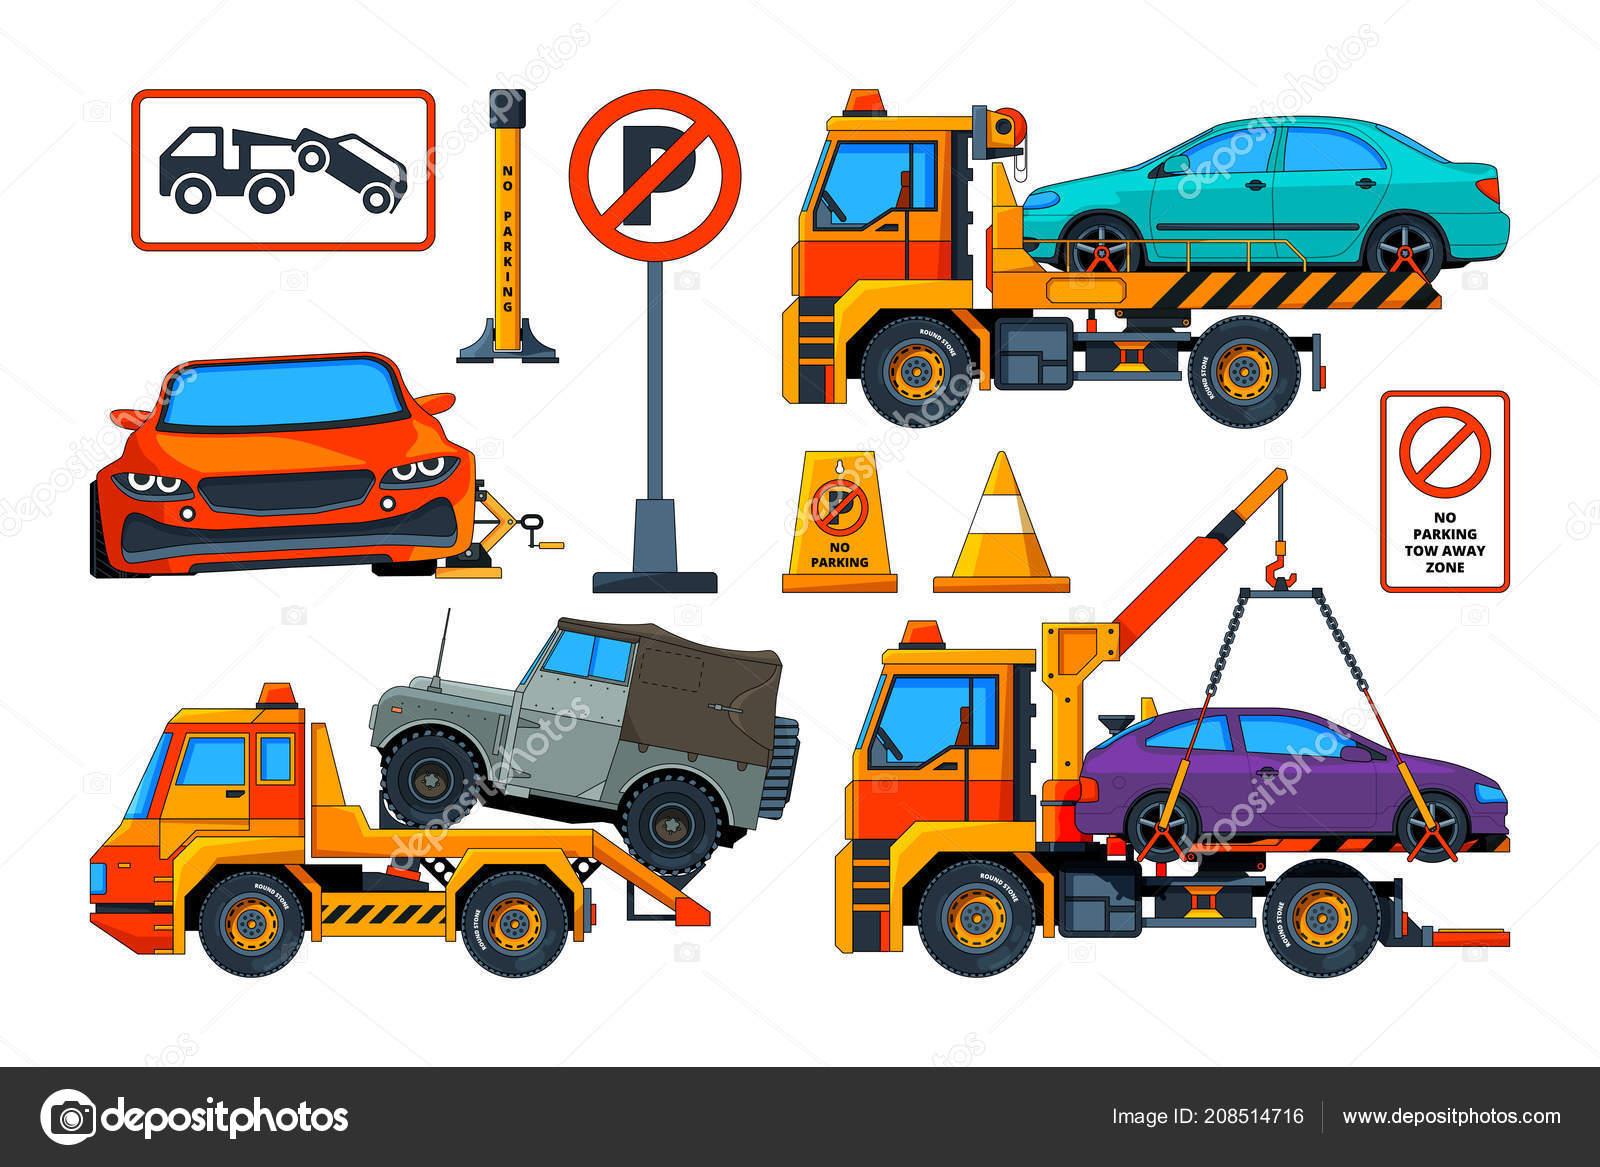 Kreslene Obrazky Aut Zde Stock Vektor C Onyxprj 208514716